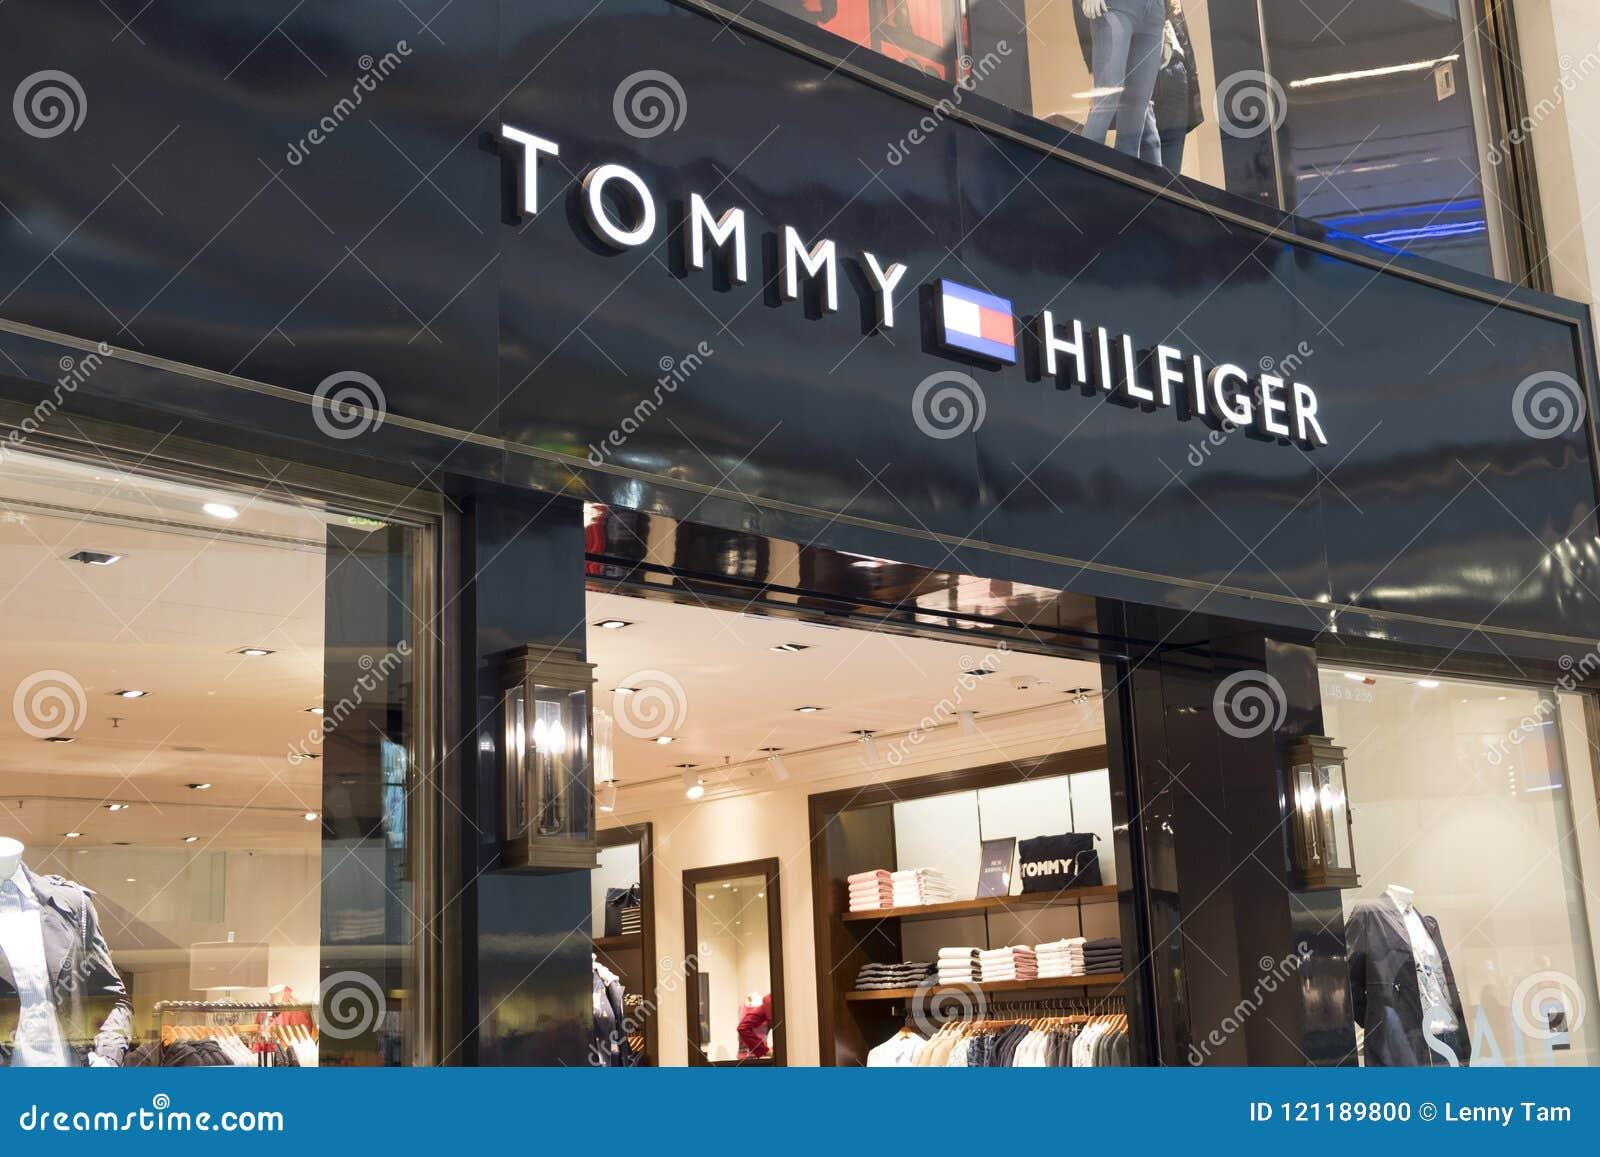 Tommy Hilfiger-Speicher in Hong Kong MÄRZ 2014: Tommy Hilfiger Childrens Speicher in der Mall Metropole